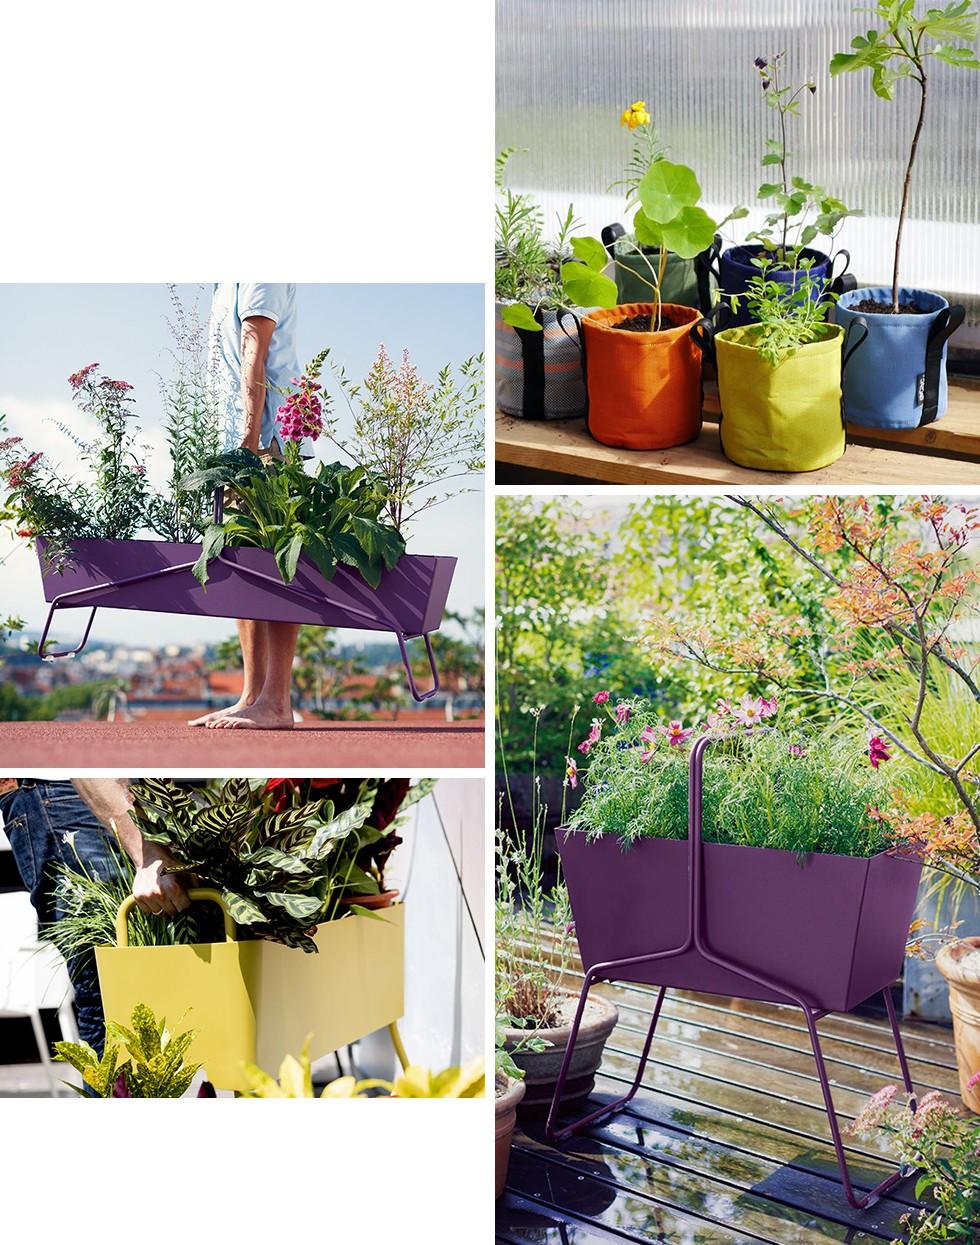 Basket Flowerpot by Fermob / Batyline® Flowerpot by Bacsac / Greens Duo Flowerpot by Maiori